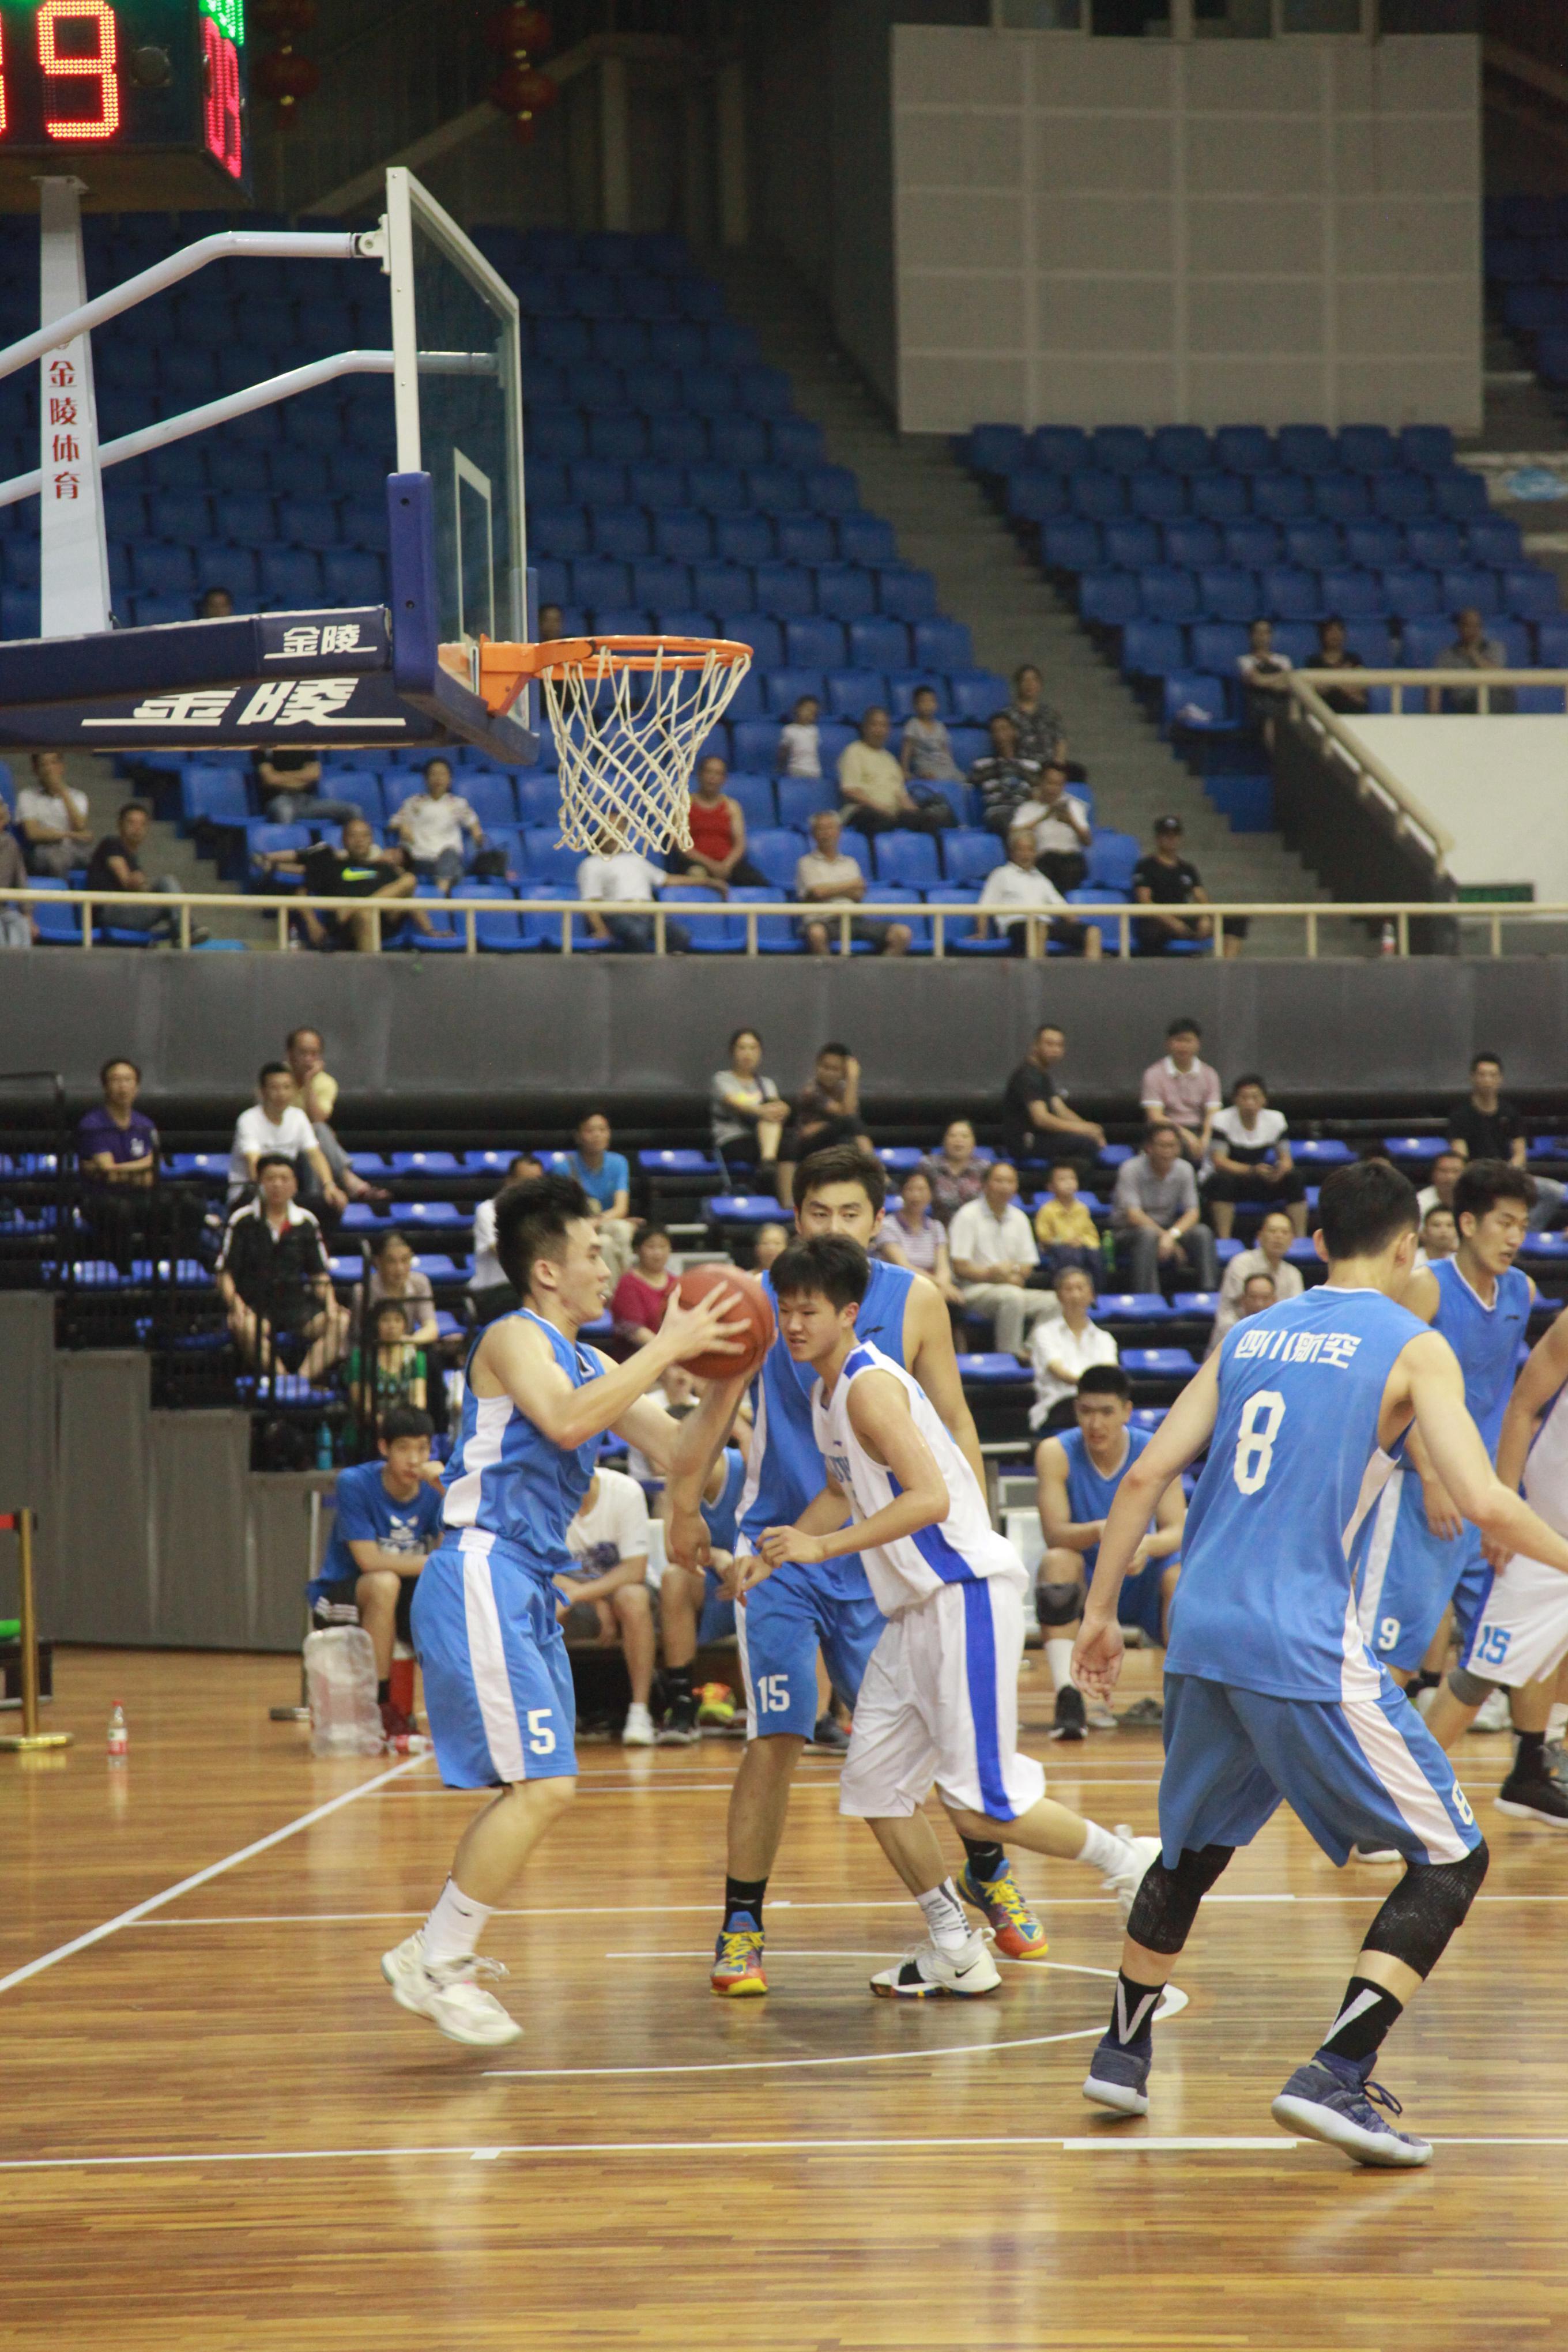 U19男篮联赛第2阶段-四川广厦2连胜 广东擒深圳